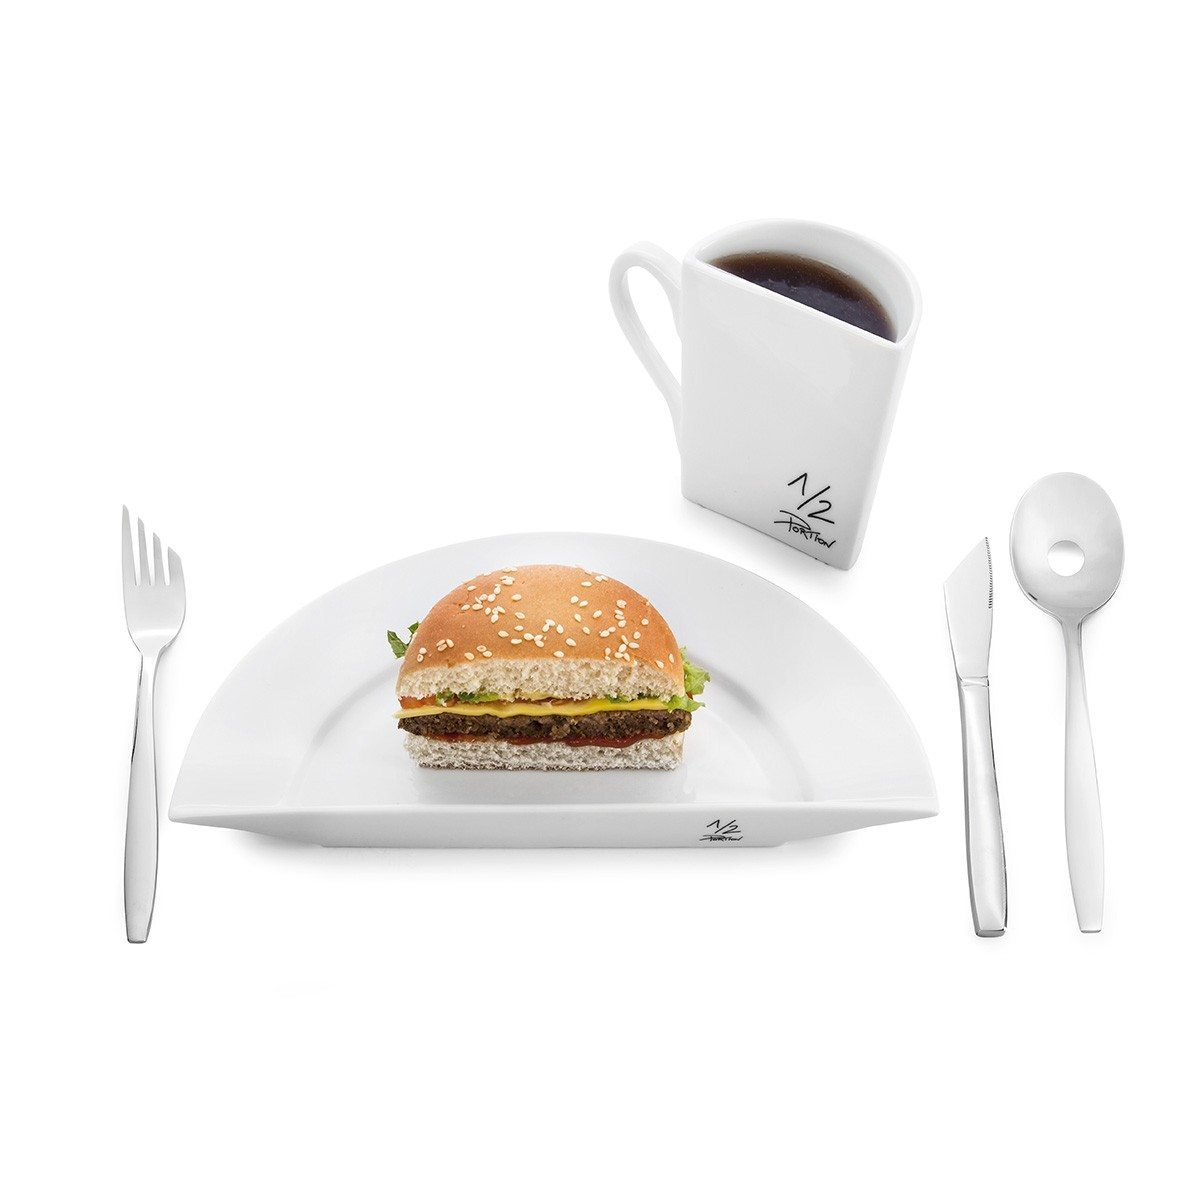 Halv portion-service